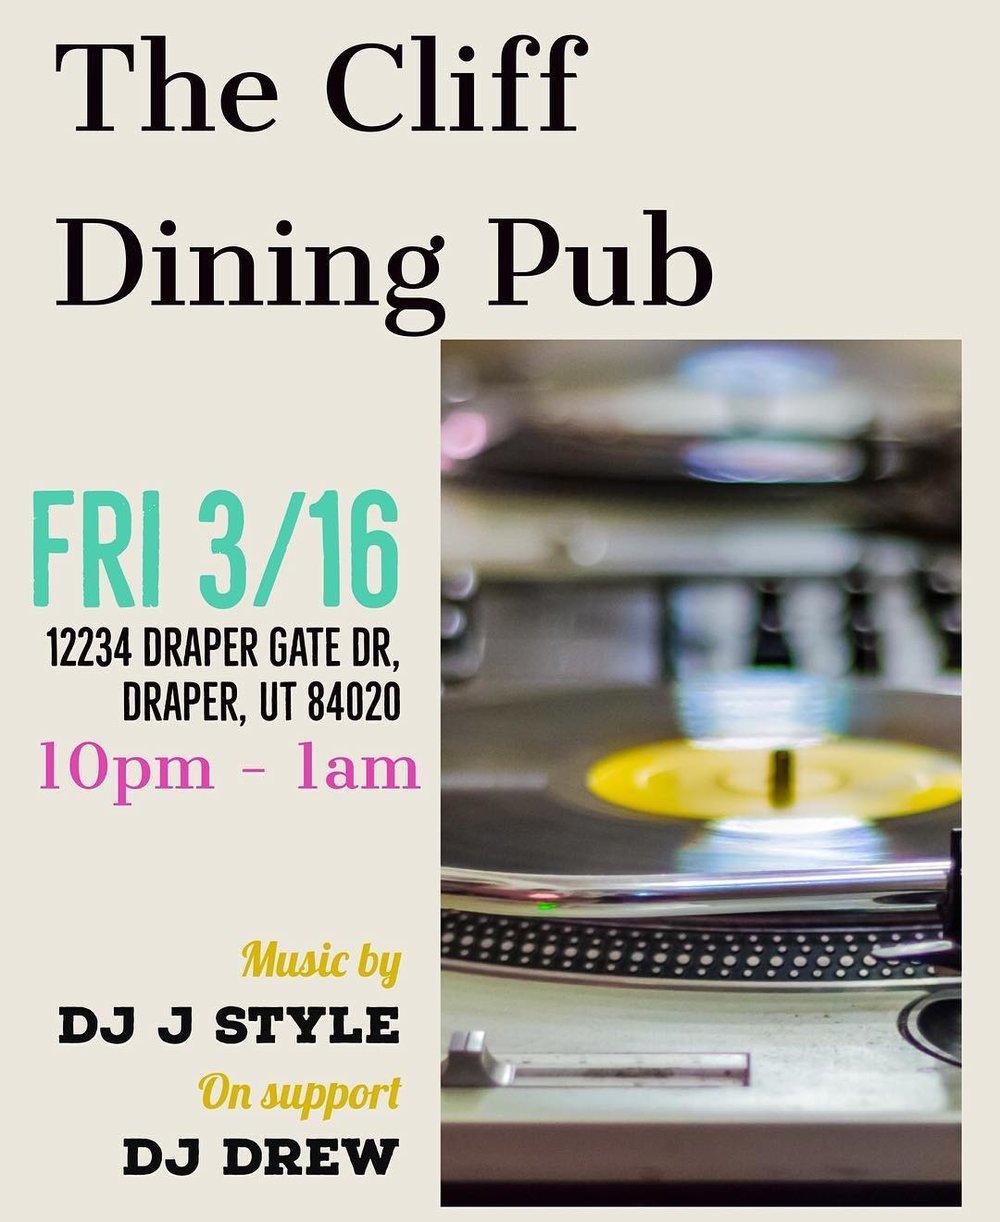 Cliff Dining Pub DJ Music